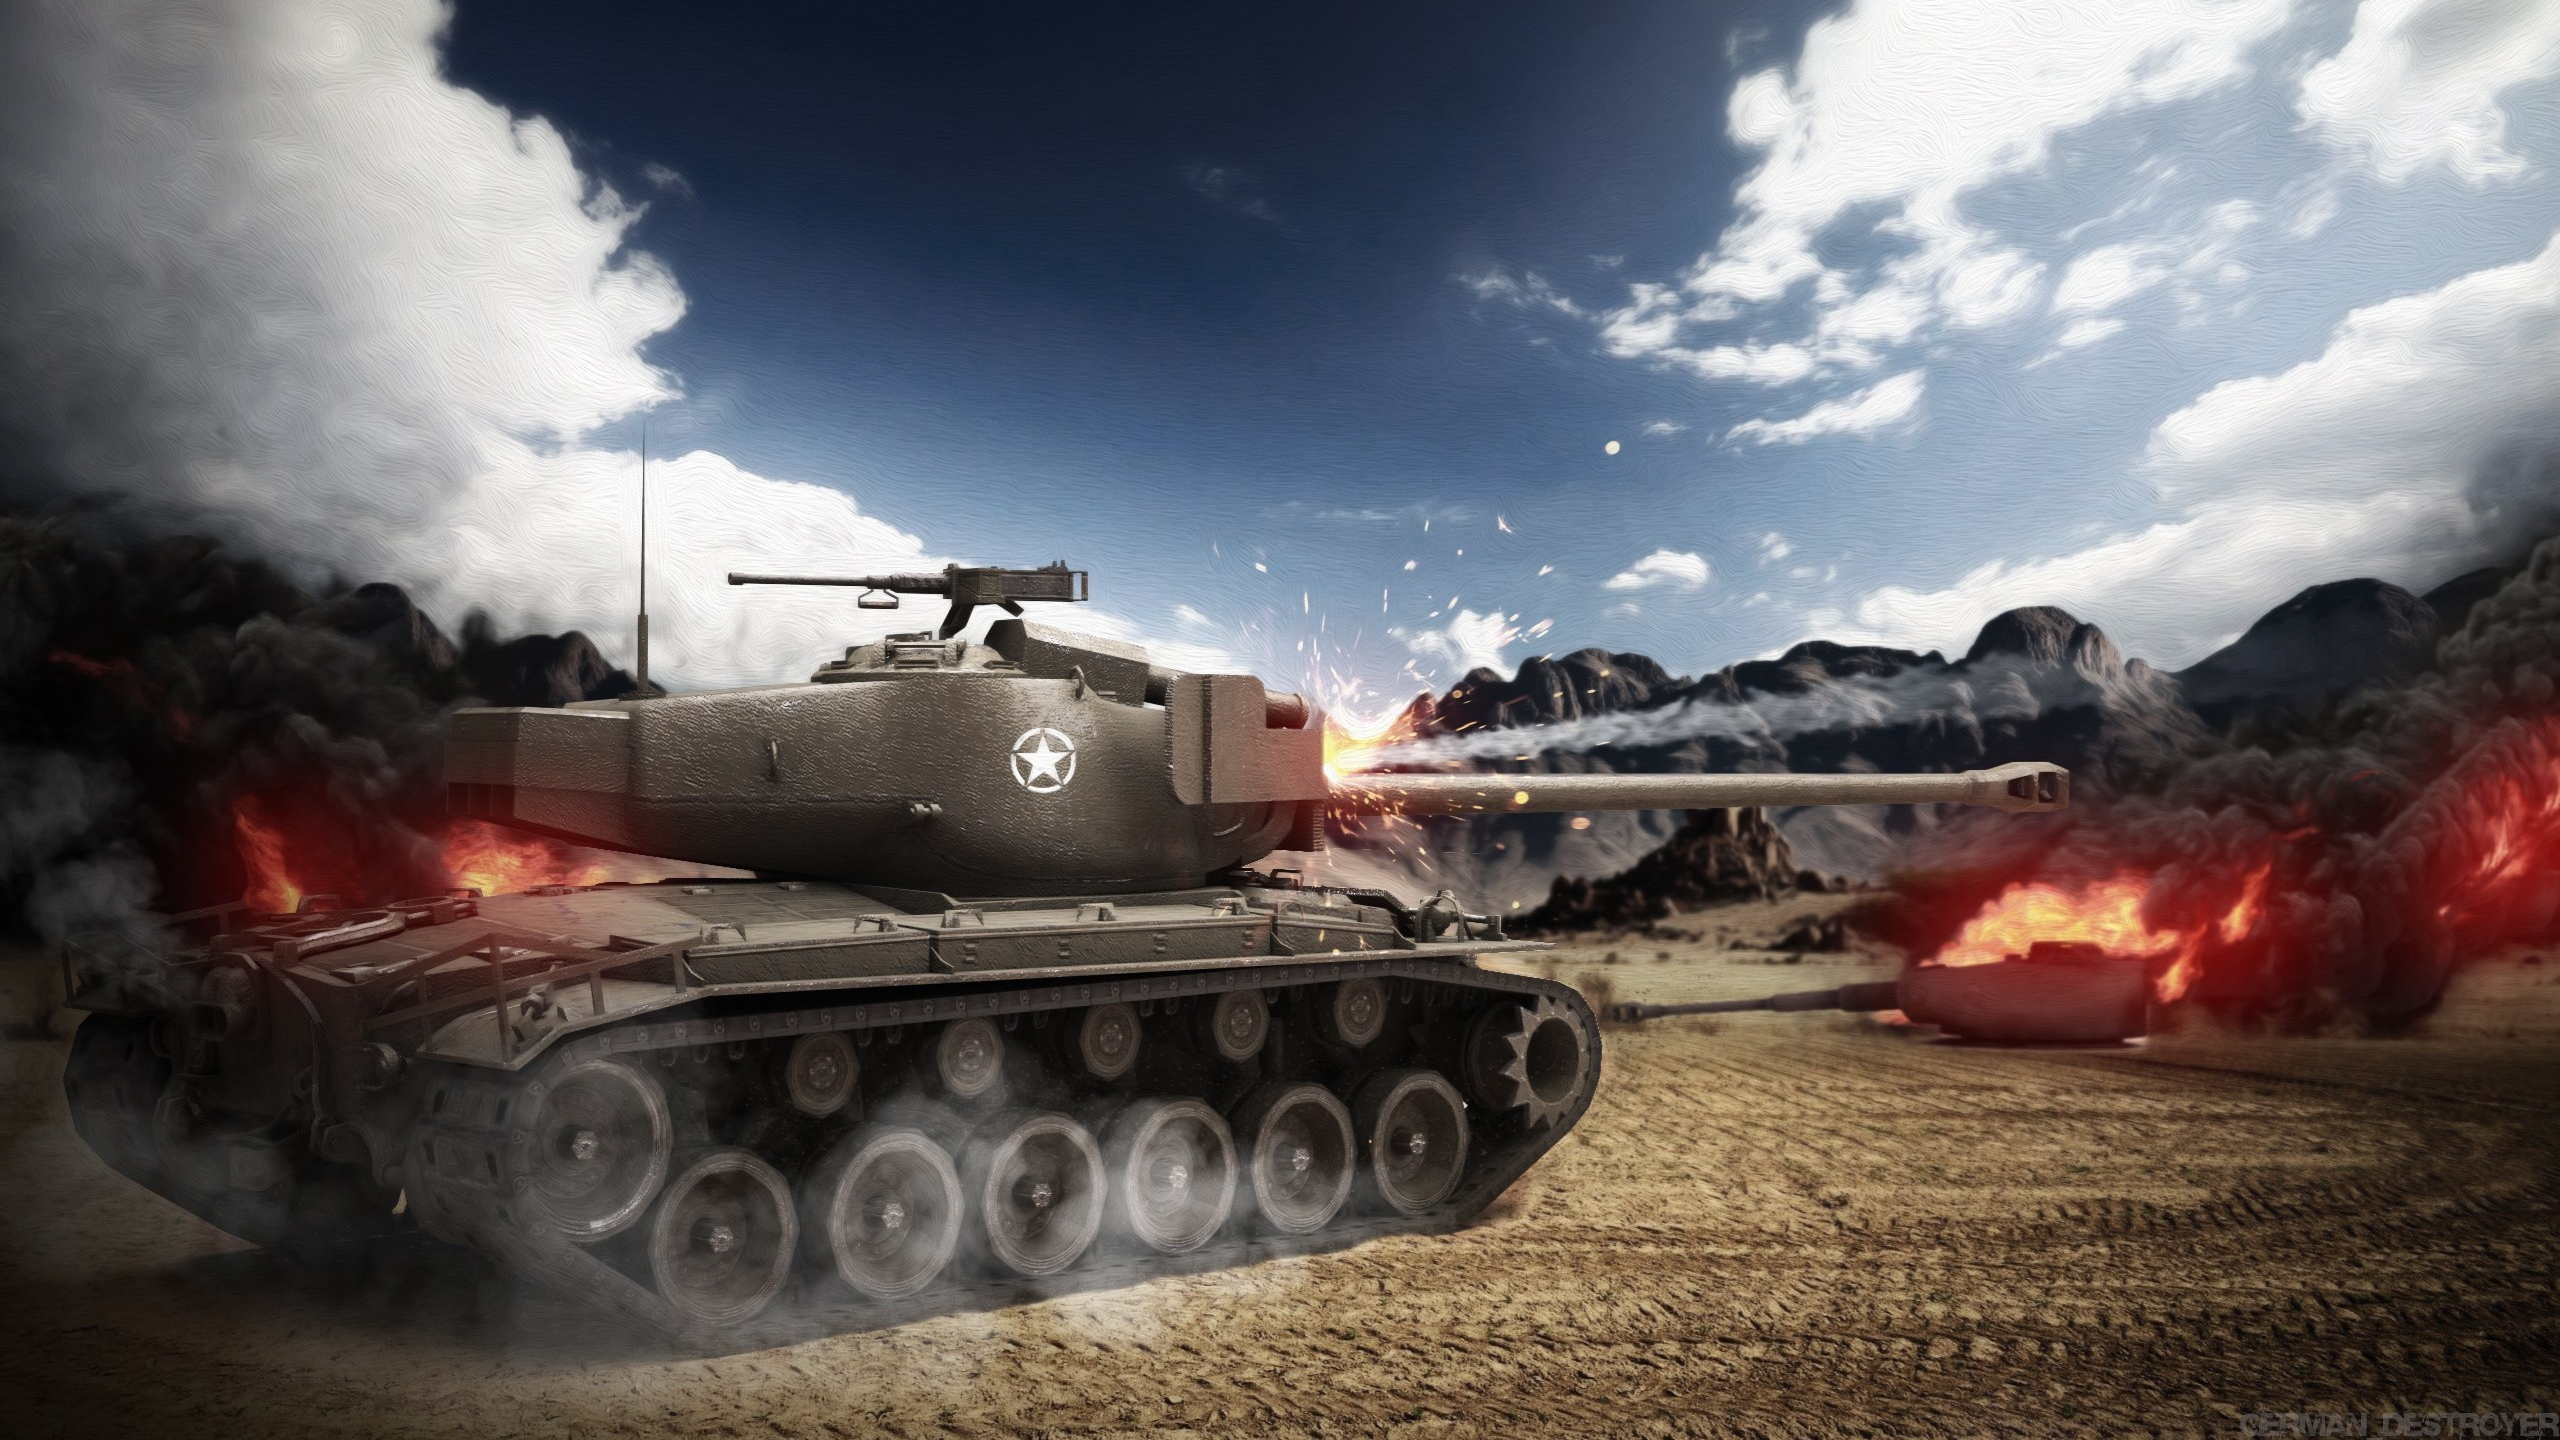 Картинки танков в мир танков